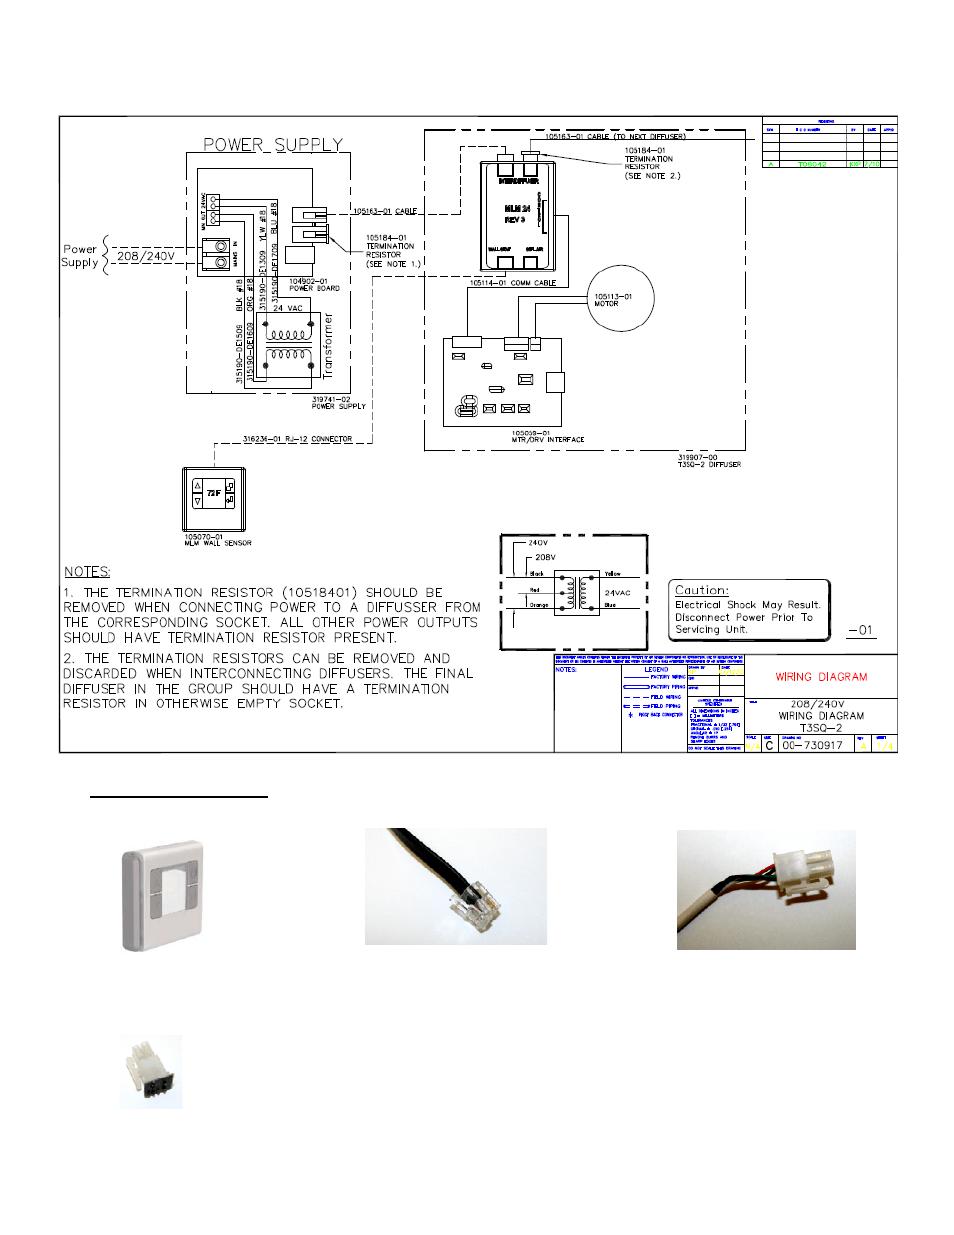 medium resolution of titus wiring diagram wiring diagramtitus wiring diagram wiring librarytitus t3sq 2 iom user manual page 6